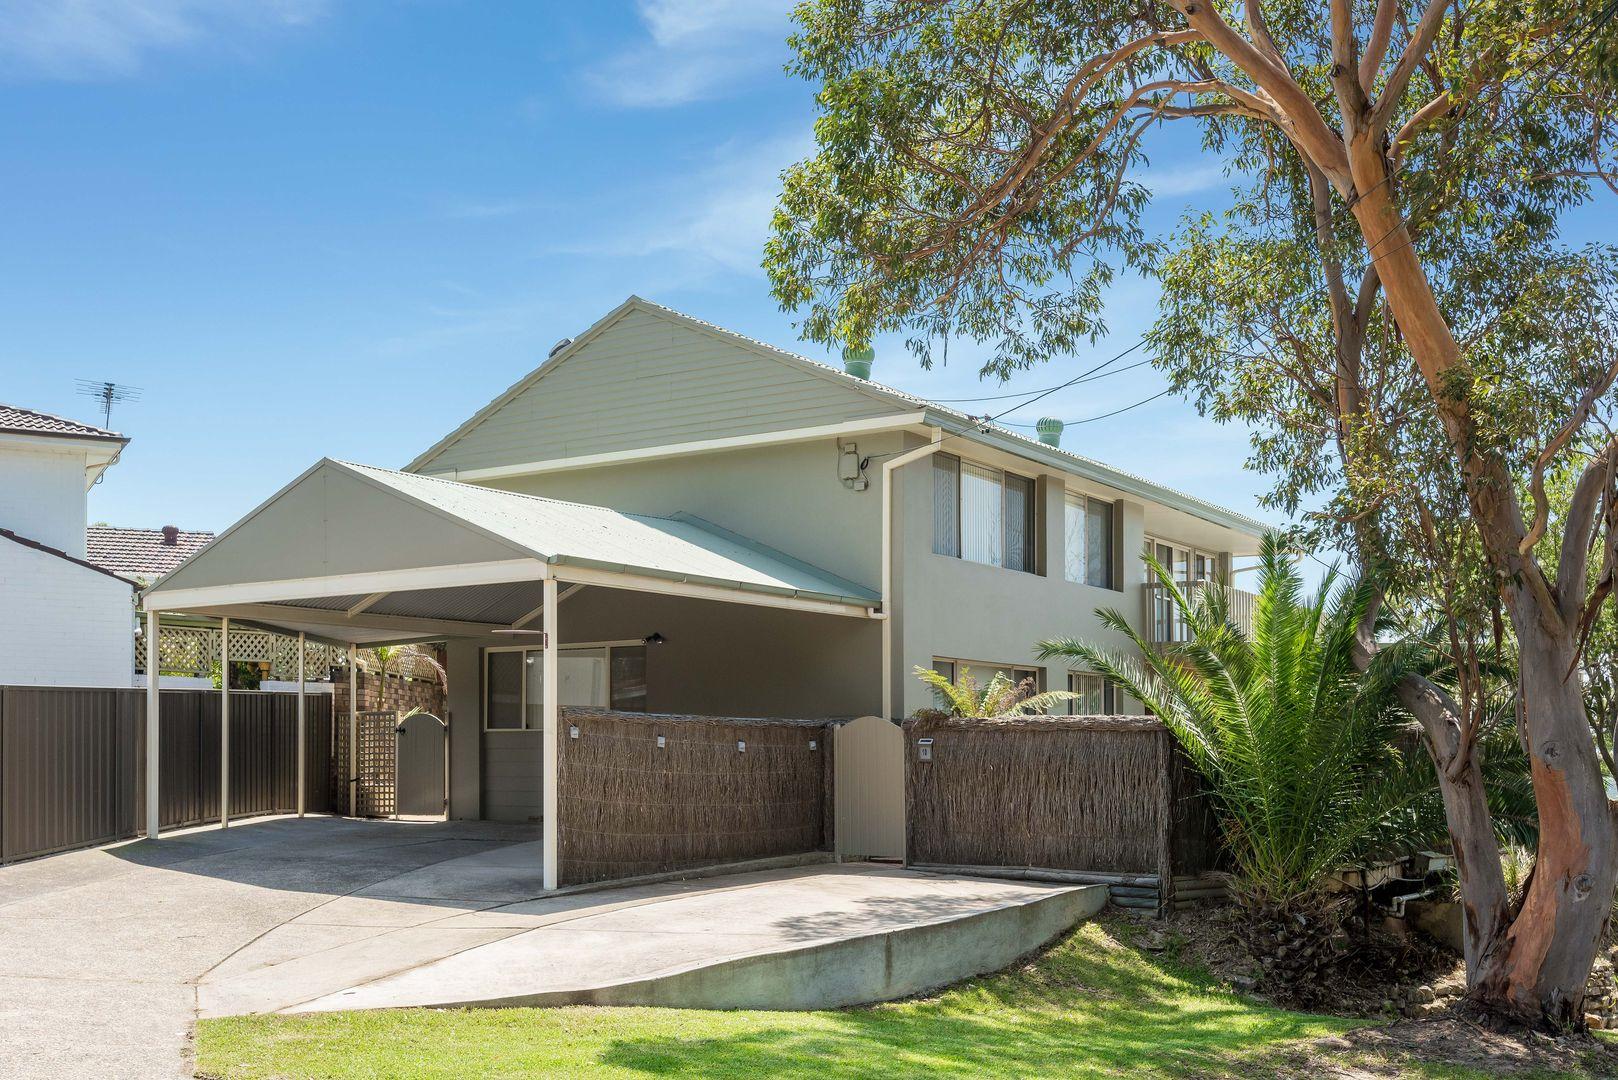 10 Kookaburra Place, Grays Point NSW 2232, Image 0